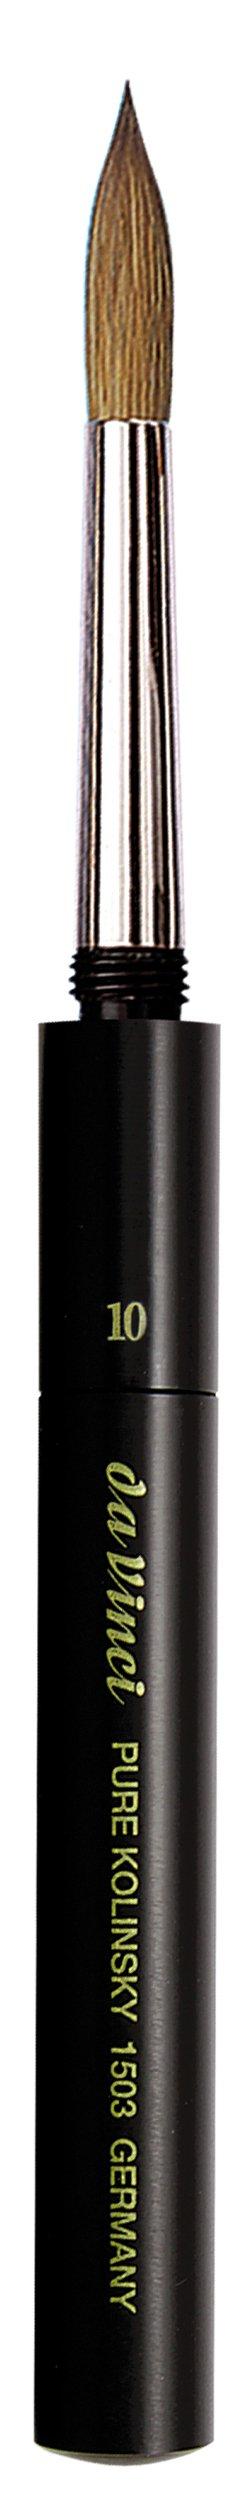 da Vinci Travel Series 1503 Maestro Watercolor Brush, Round Kolinsky Red Sable with Pocket Case Handle, Size 10